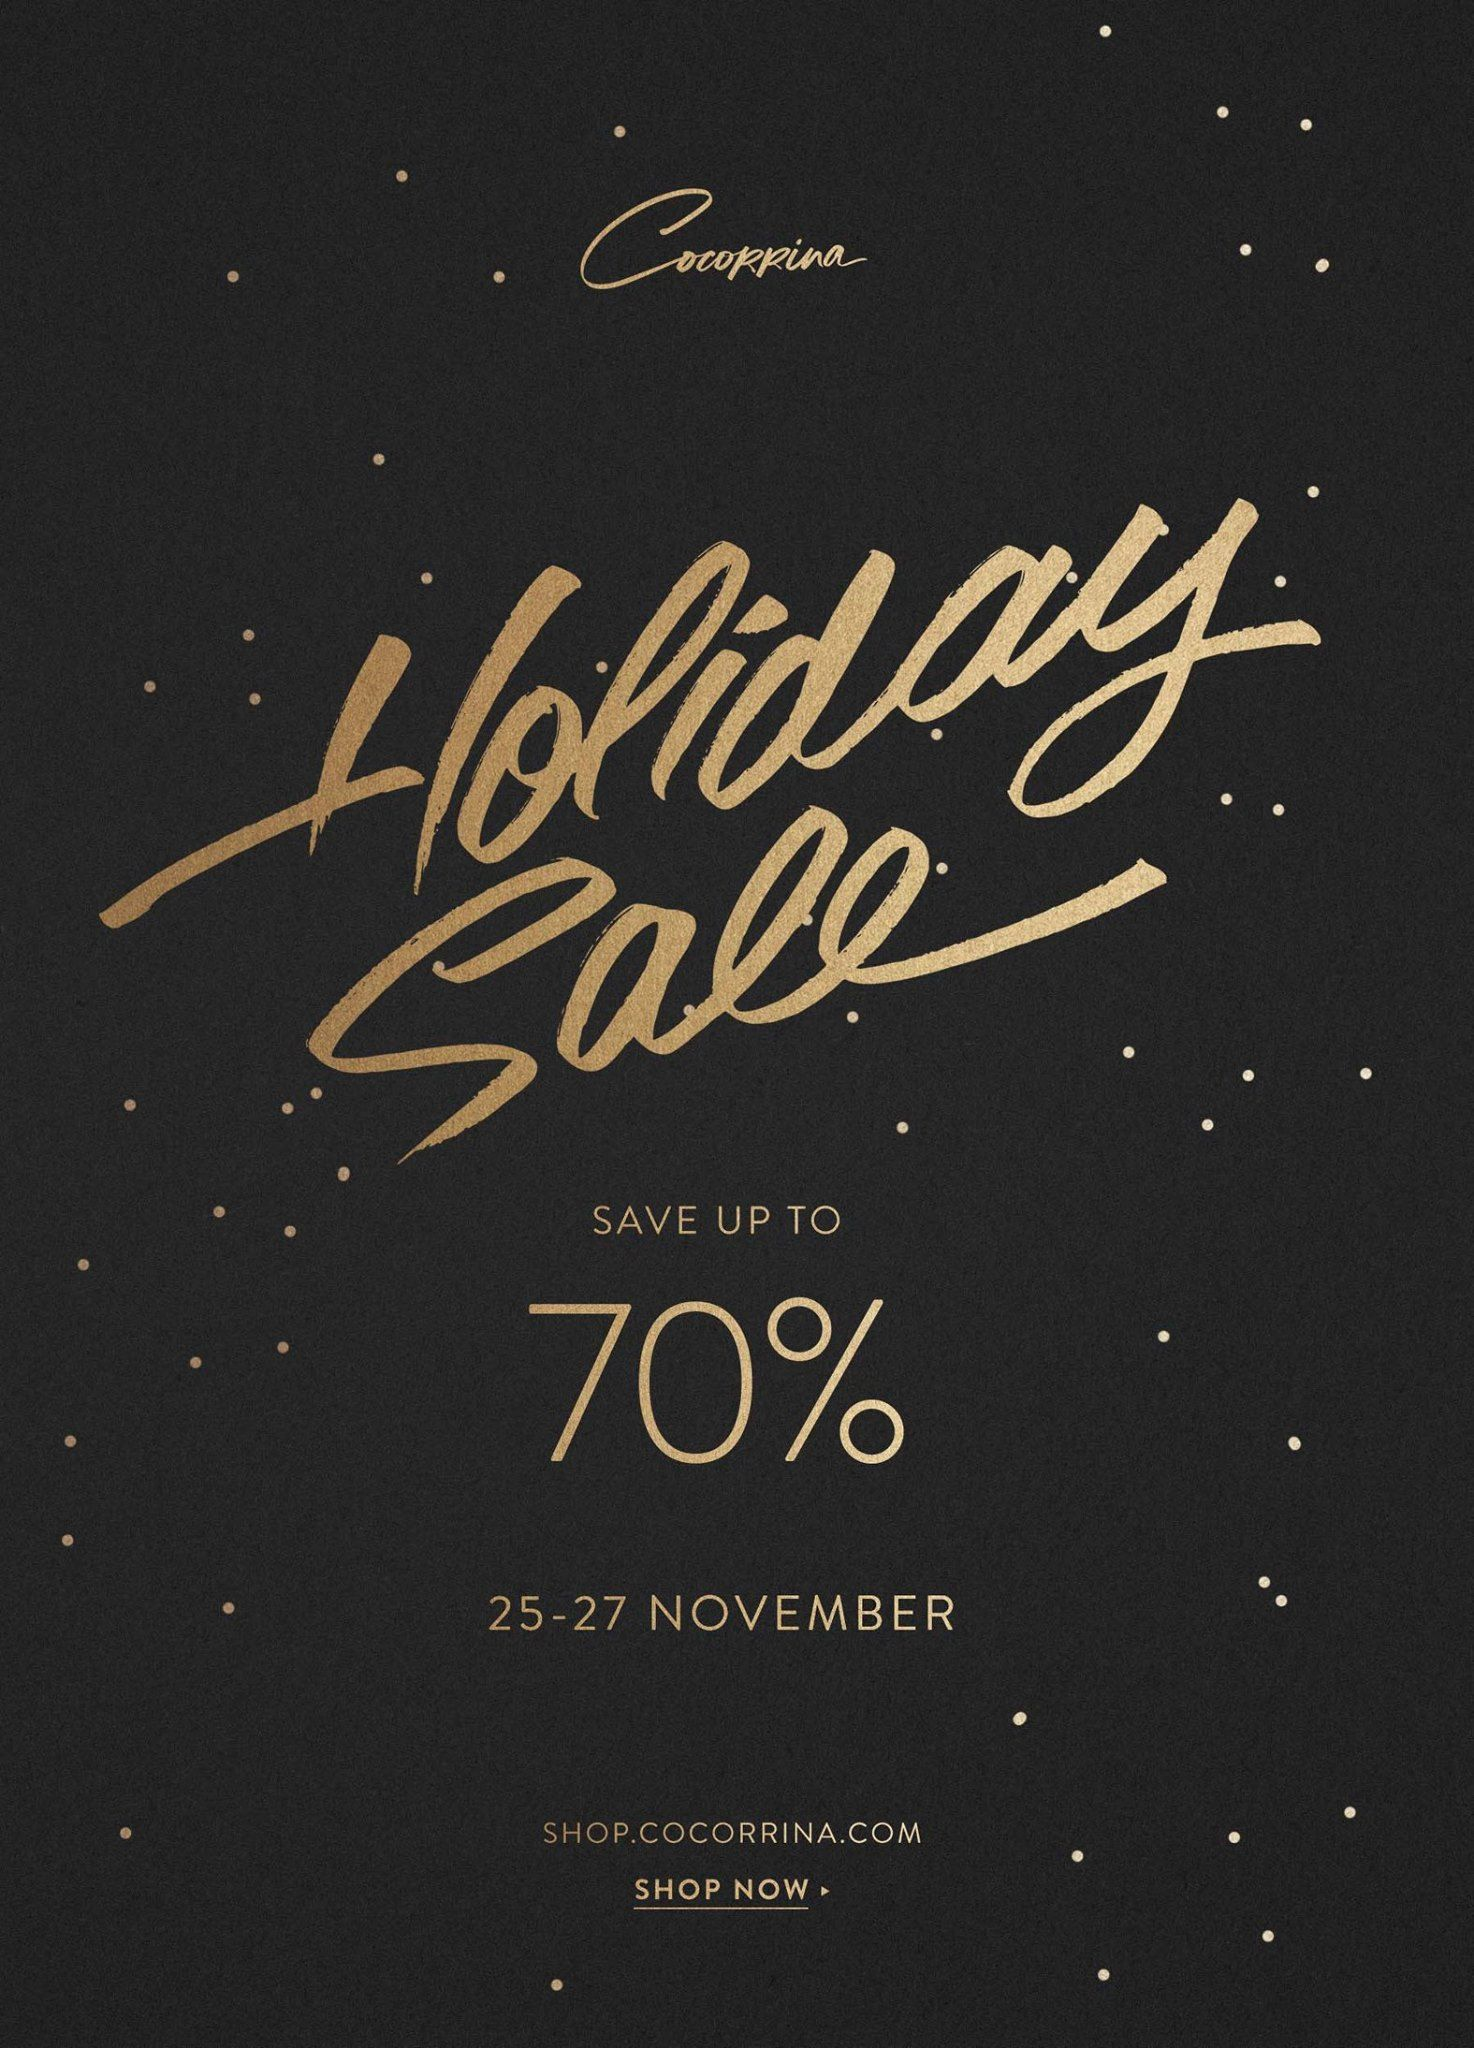 Cocorrina Holiday Sale